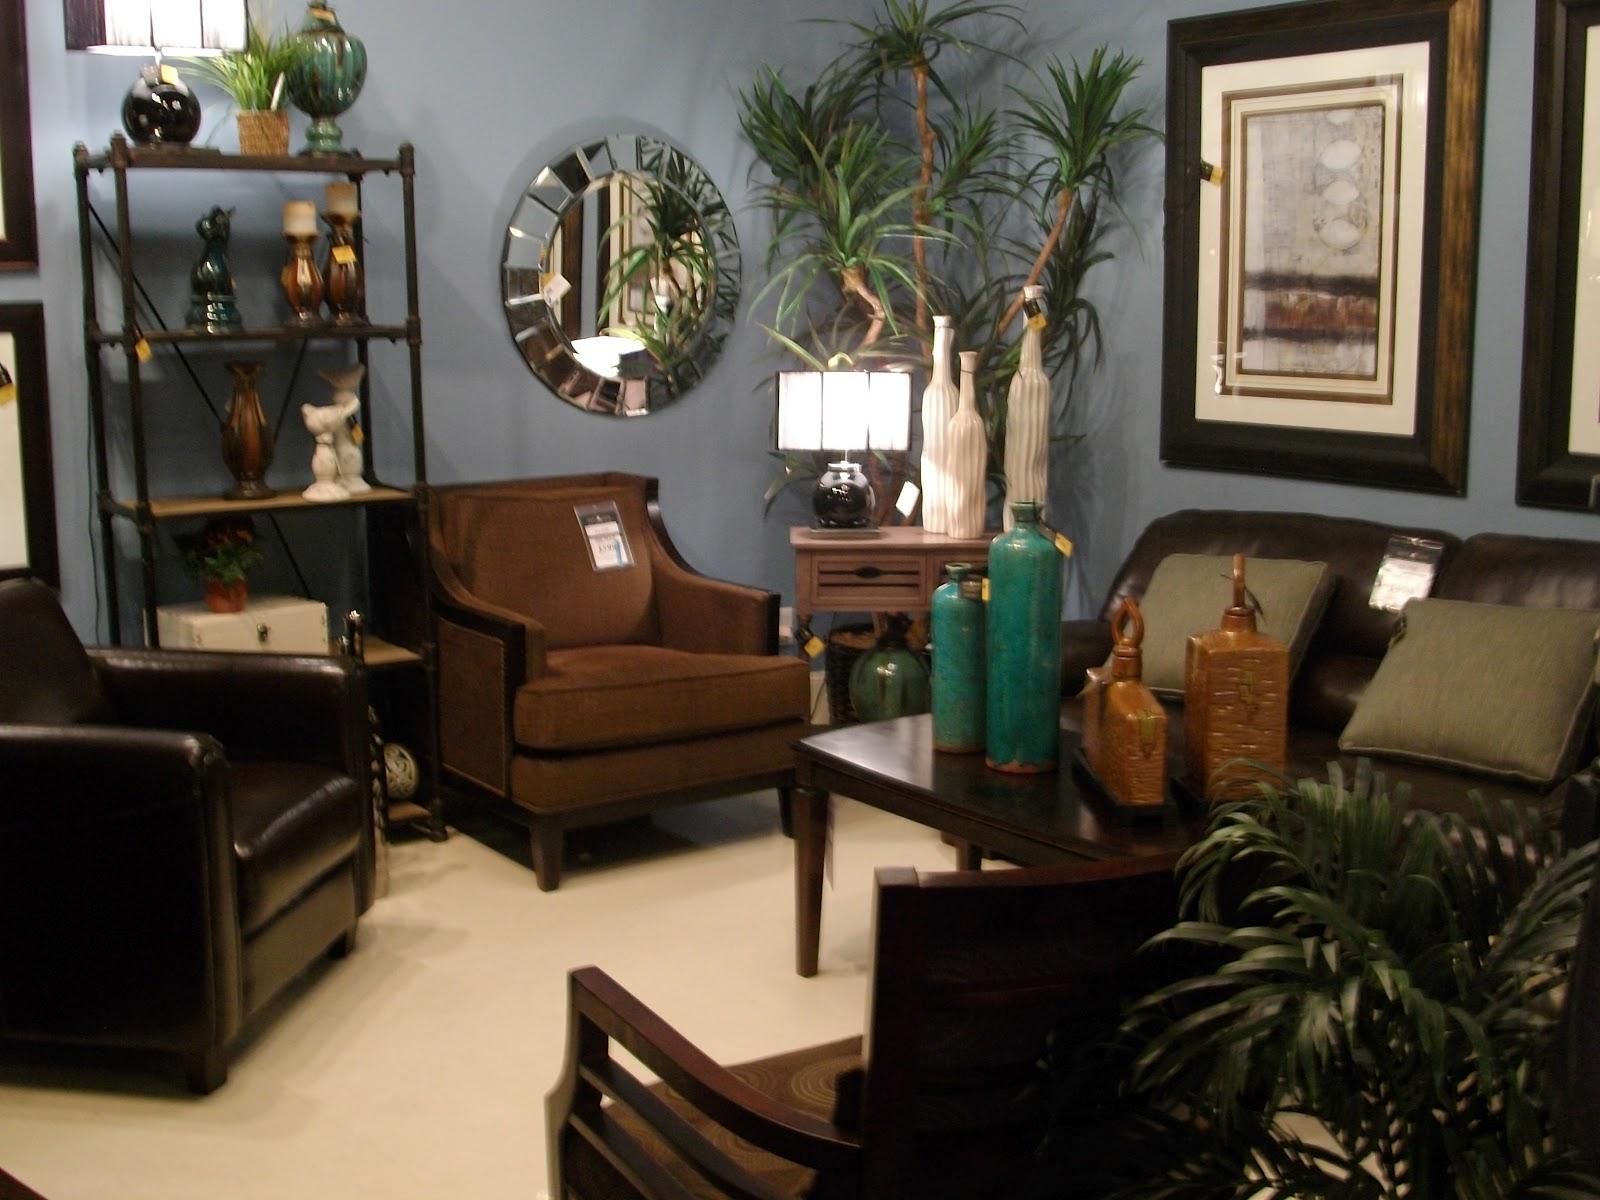 Room Decor Design Osmond Designs